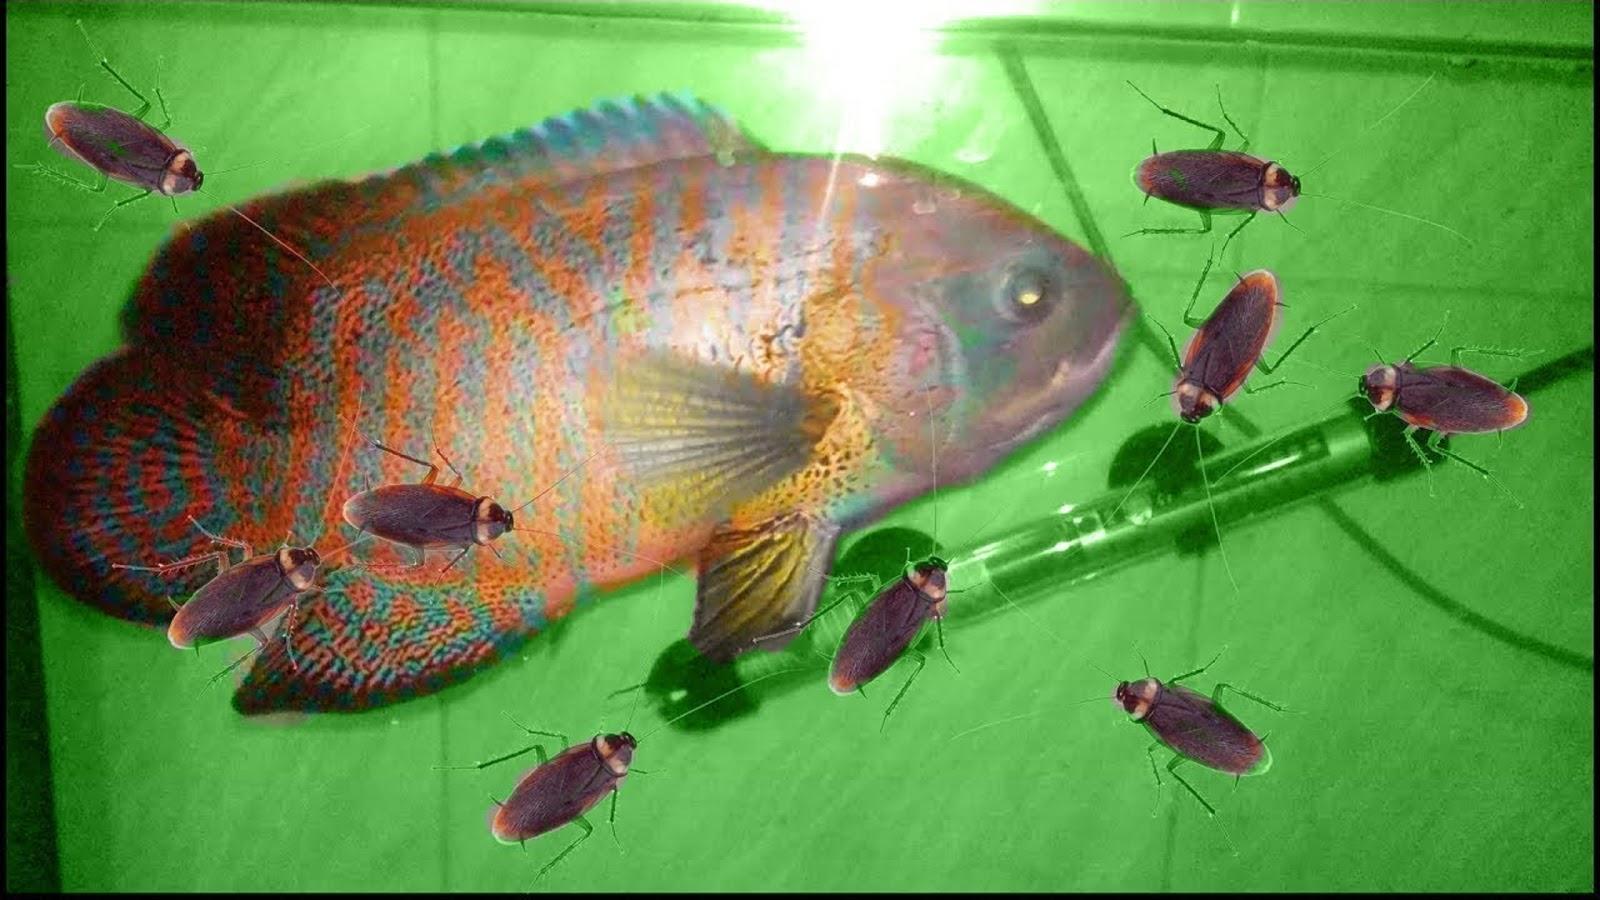 Oscar Fish VS Cockroaches